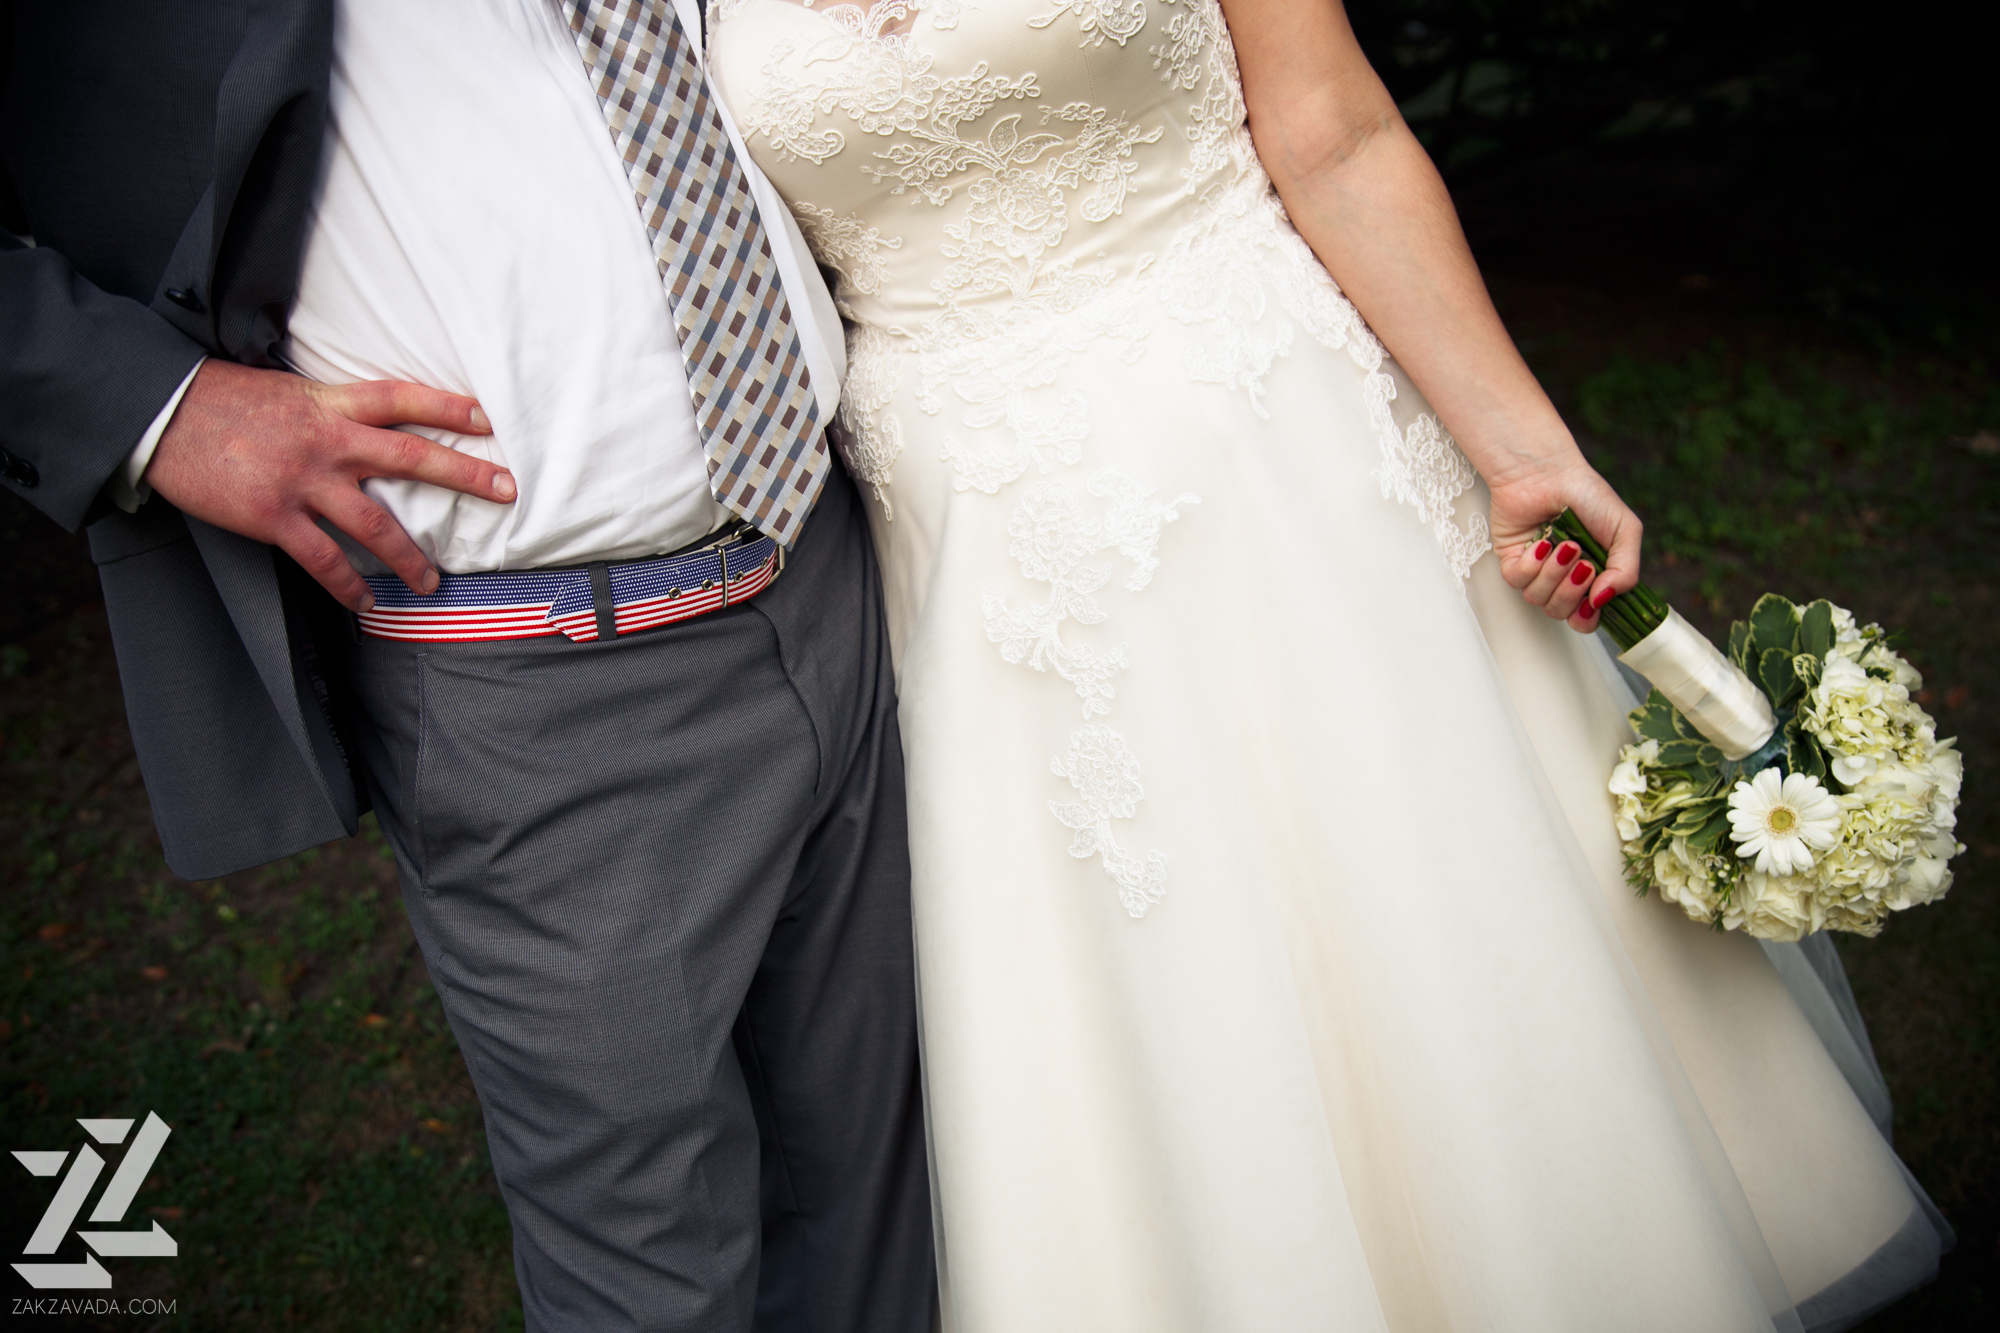 scranton-wedding-photography-zak-zavada-meganJonathan-436.jpg